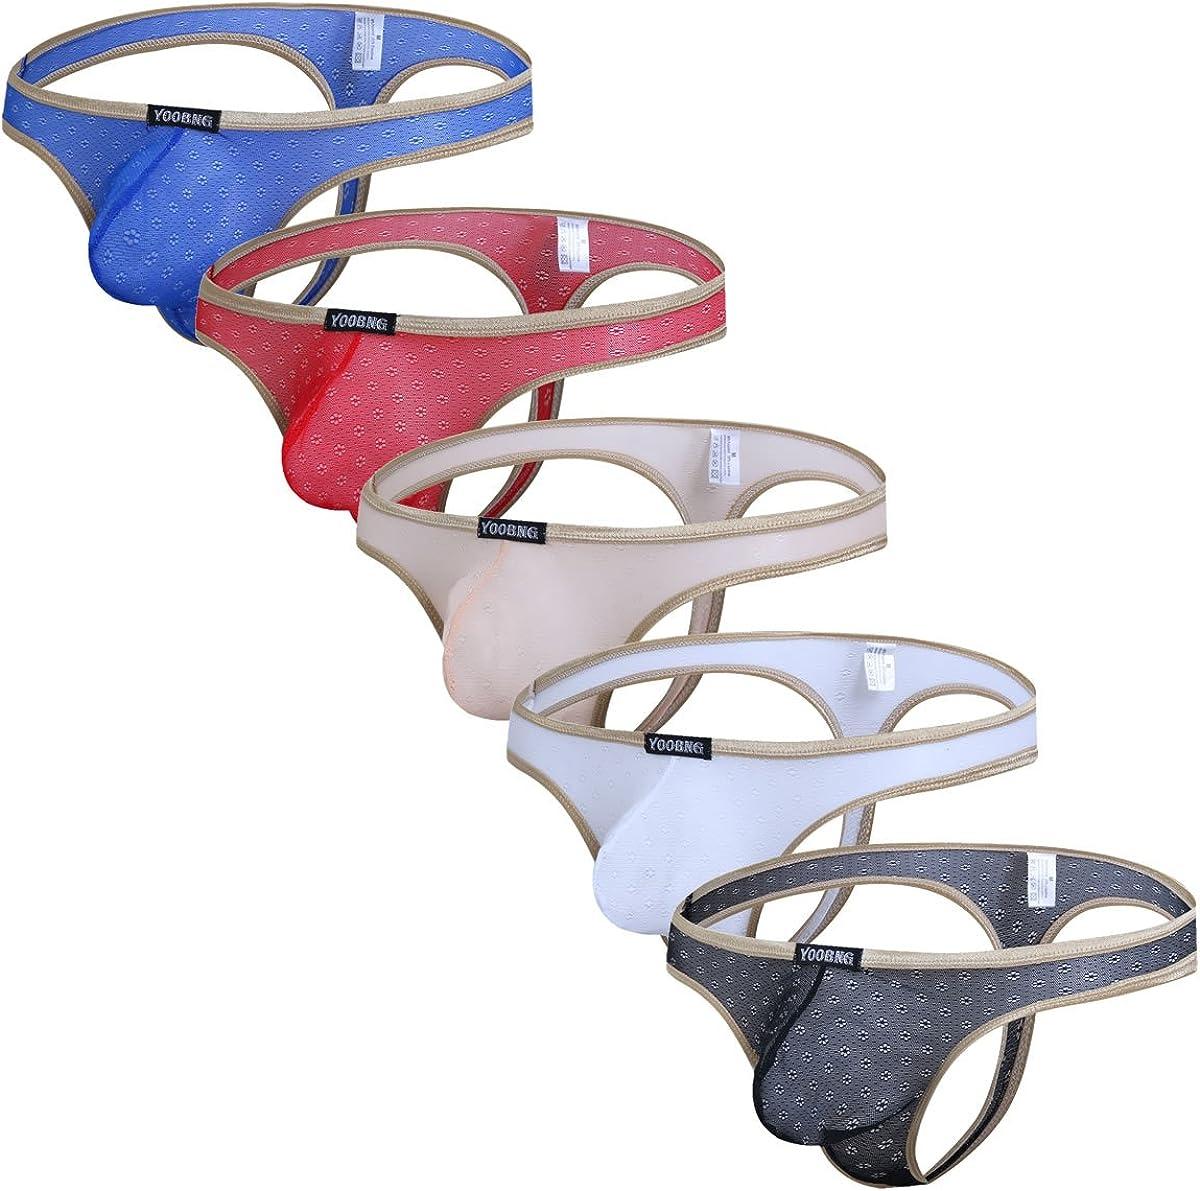 Men Lingerie Pouch  Jockstrap Thongs Underwear Bikini Panties G String Briefs